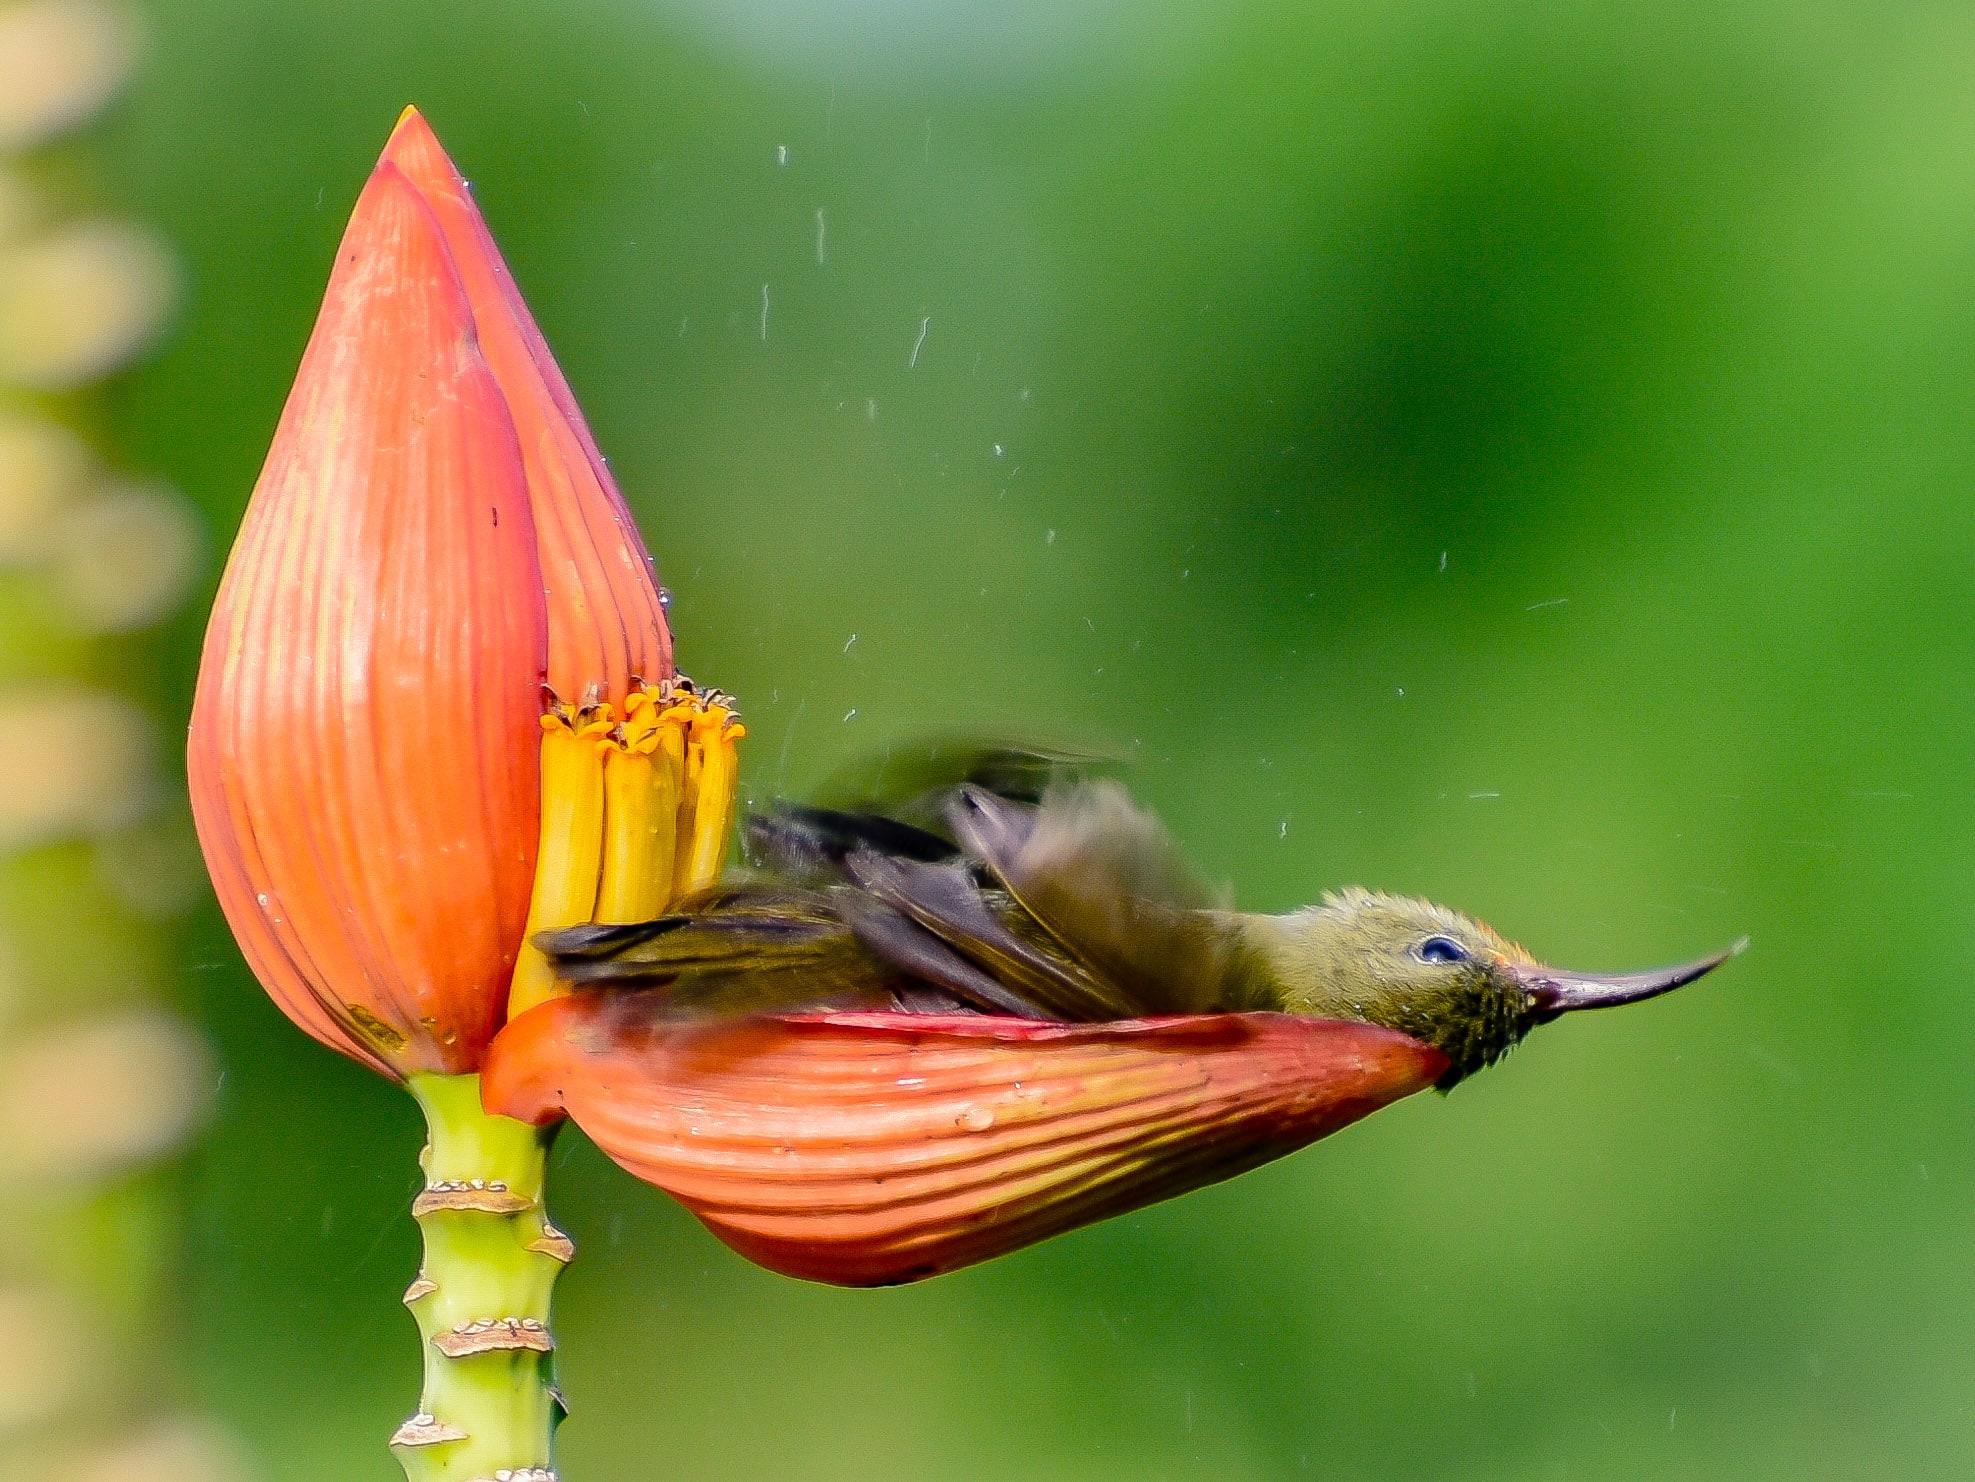 This unique bird bath was photographed by SAMUDRA SENGUPTA of Jalpaiguri, West Bengal.